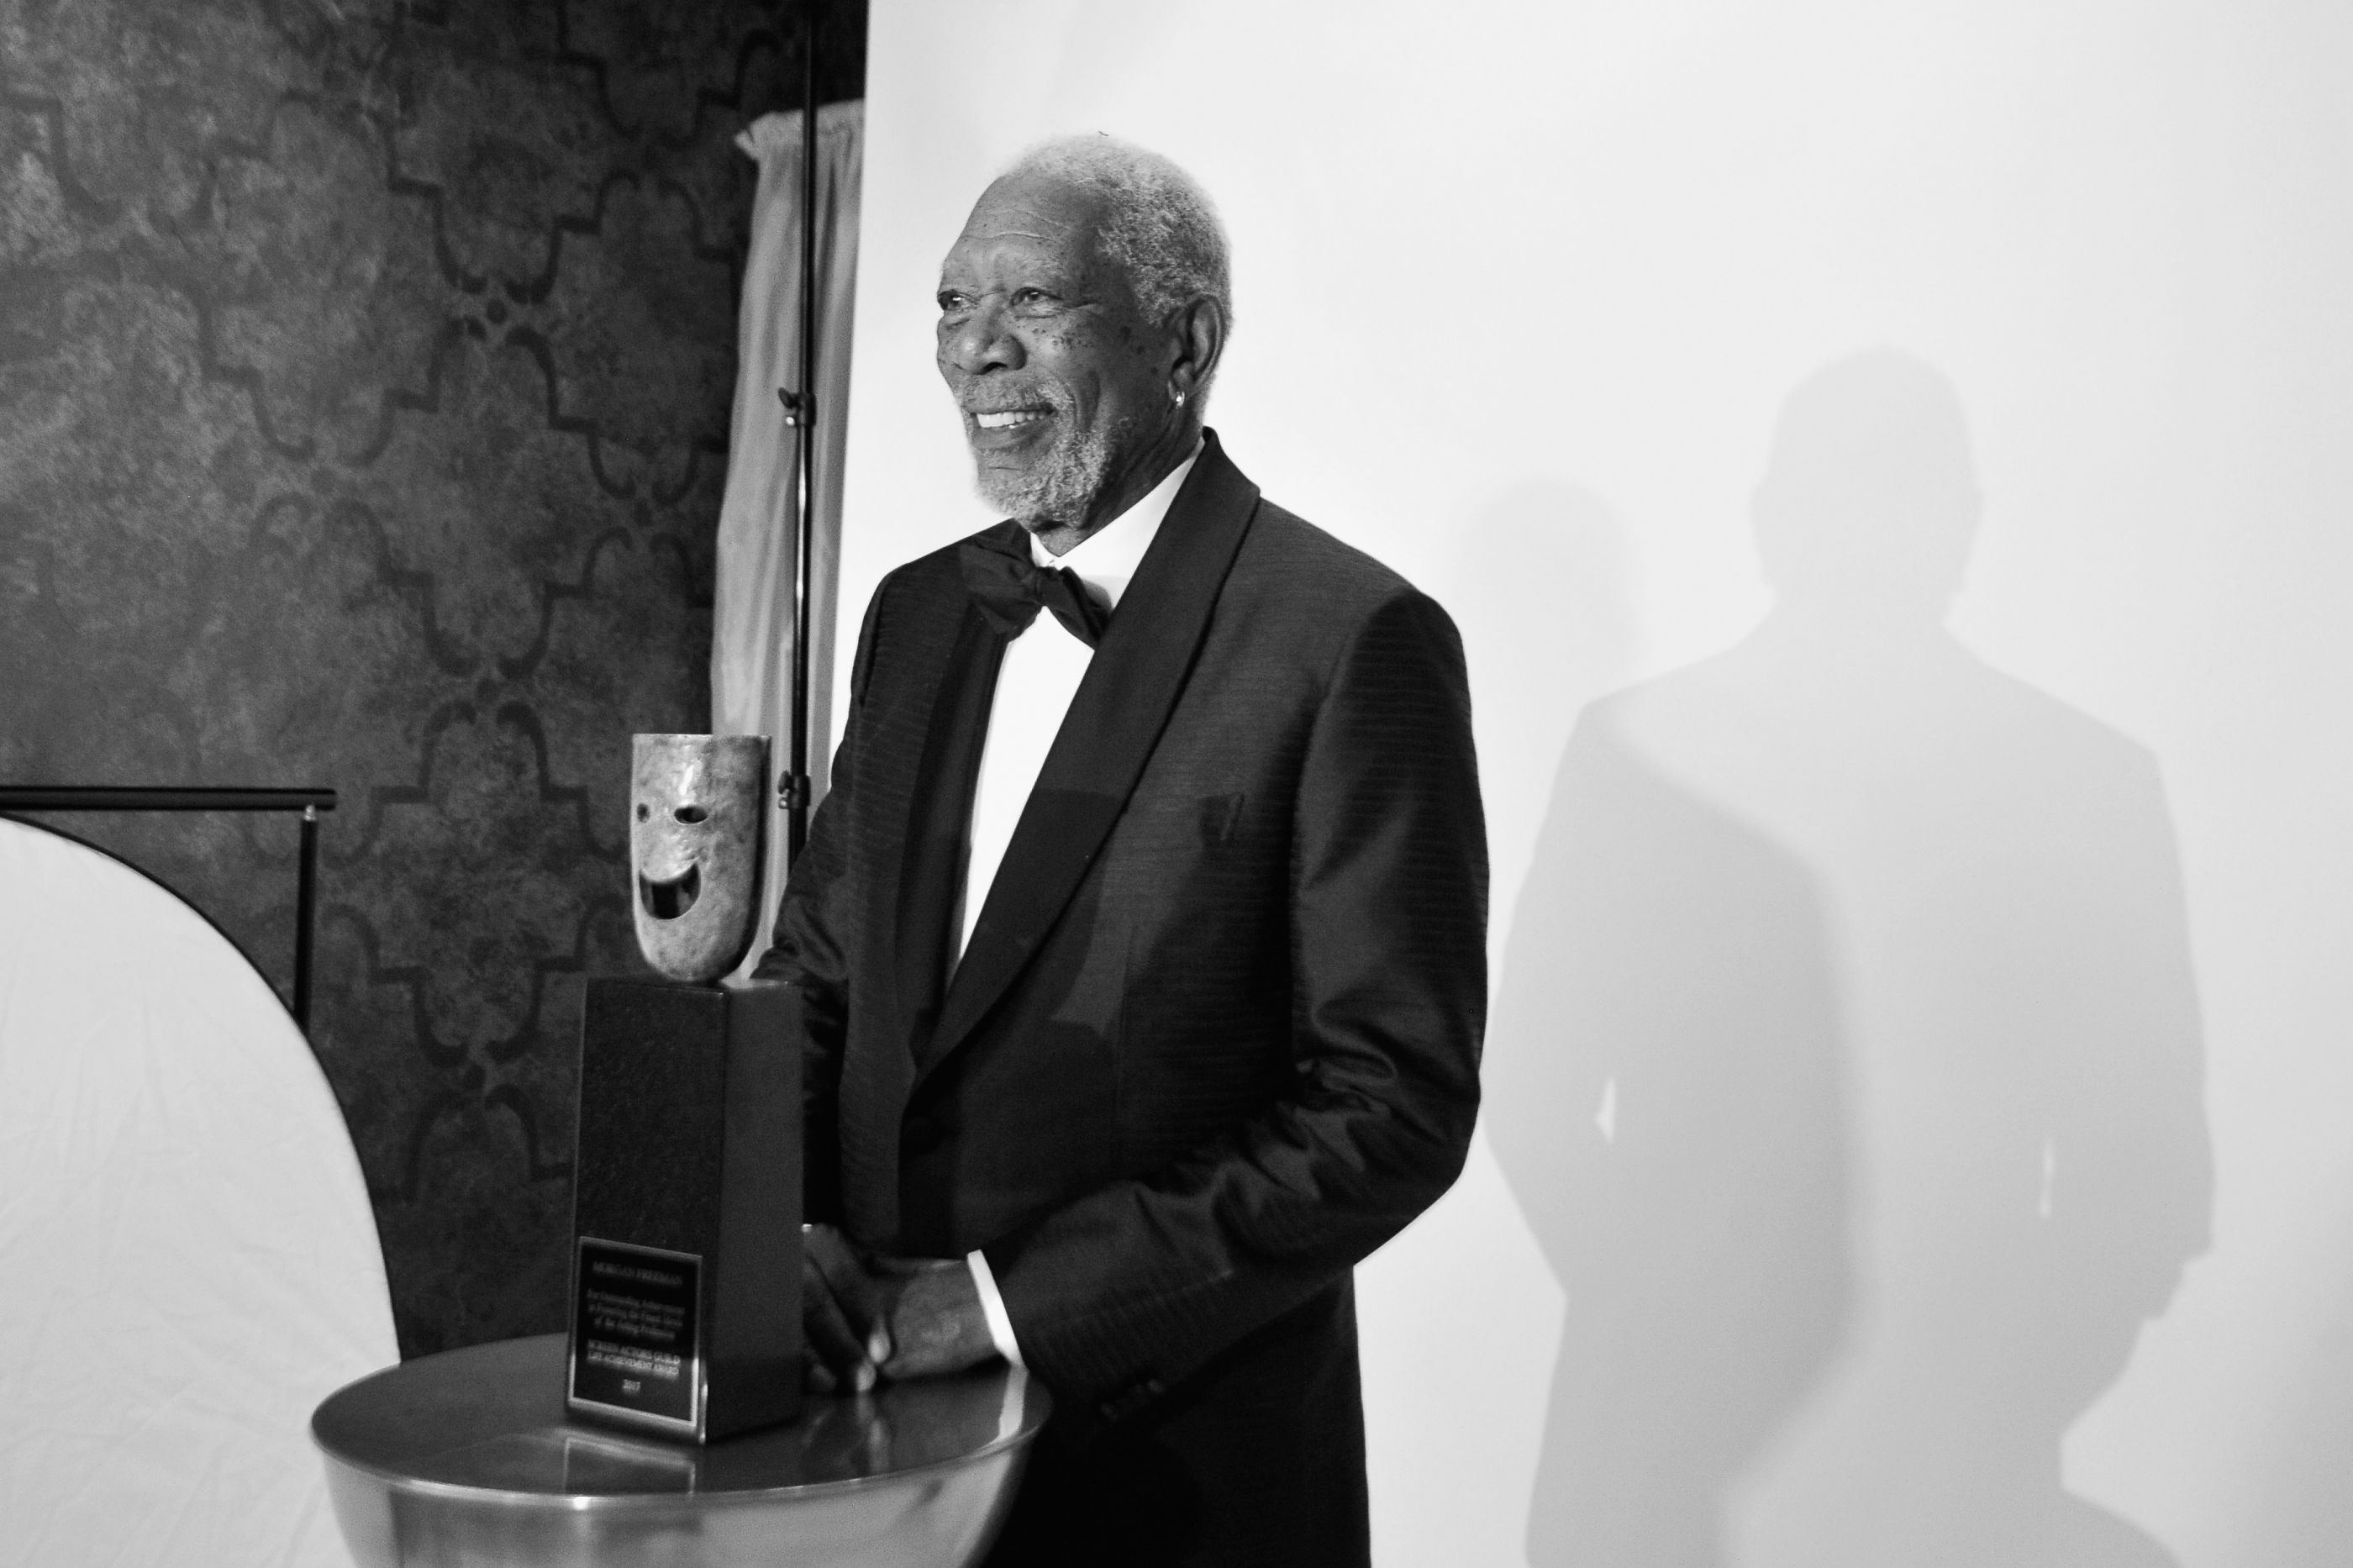 Morgan Freeman poderá perder prémio após acusações de assédio sexual